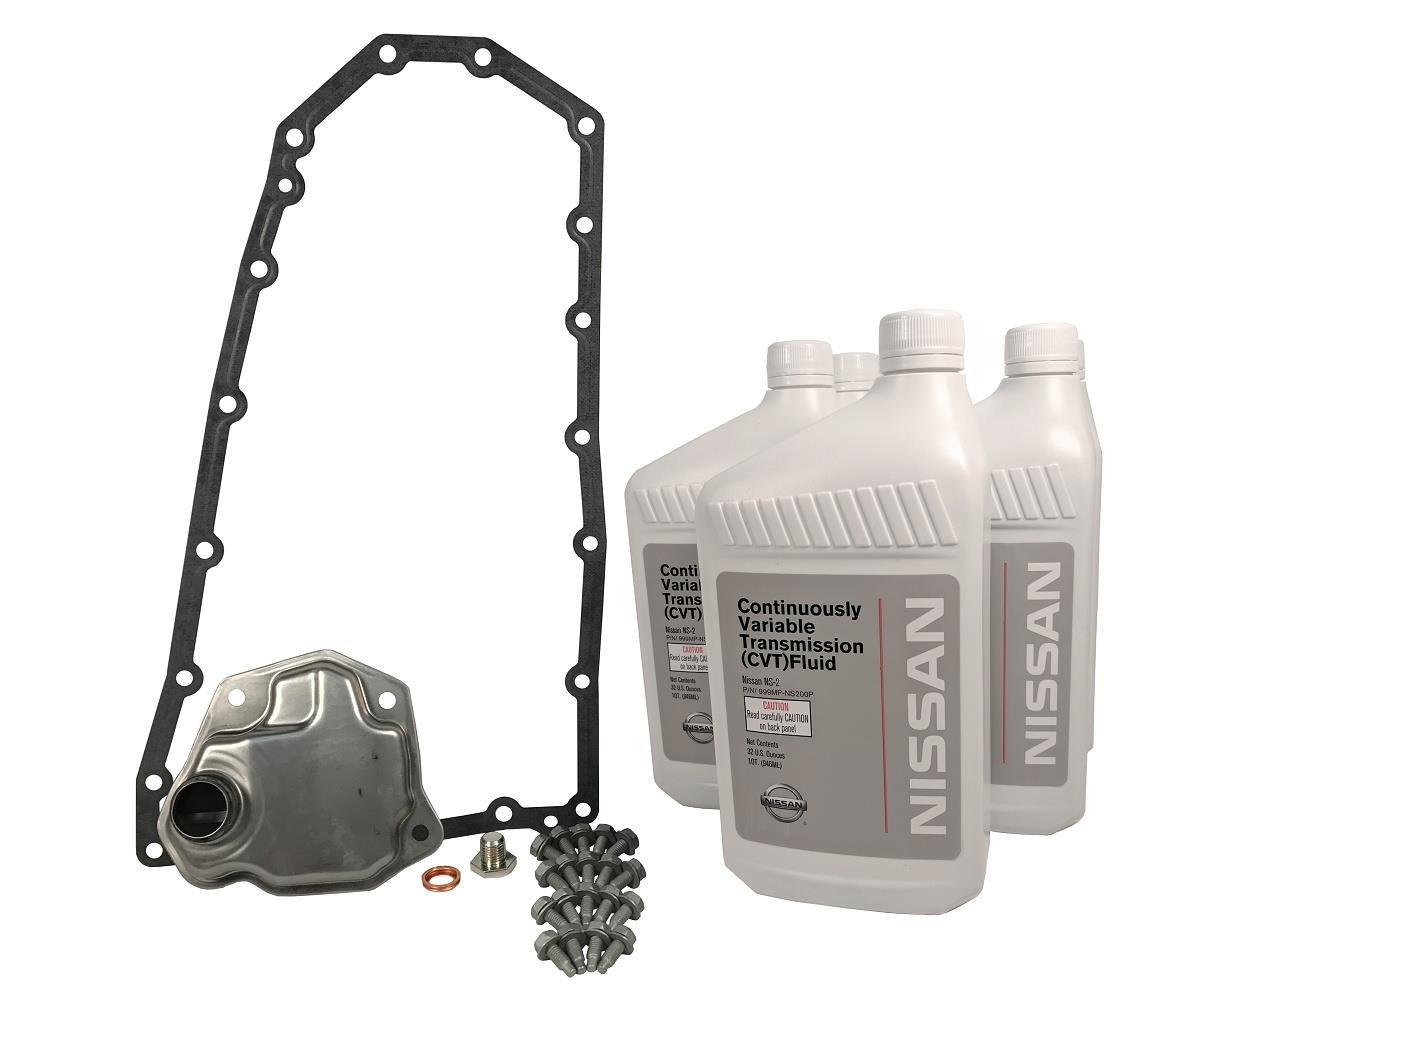 Genuine Nissan OEM CVT Maintenance Kit Nissan Altima 2007-2012 2.5 4 Cylinder